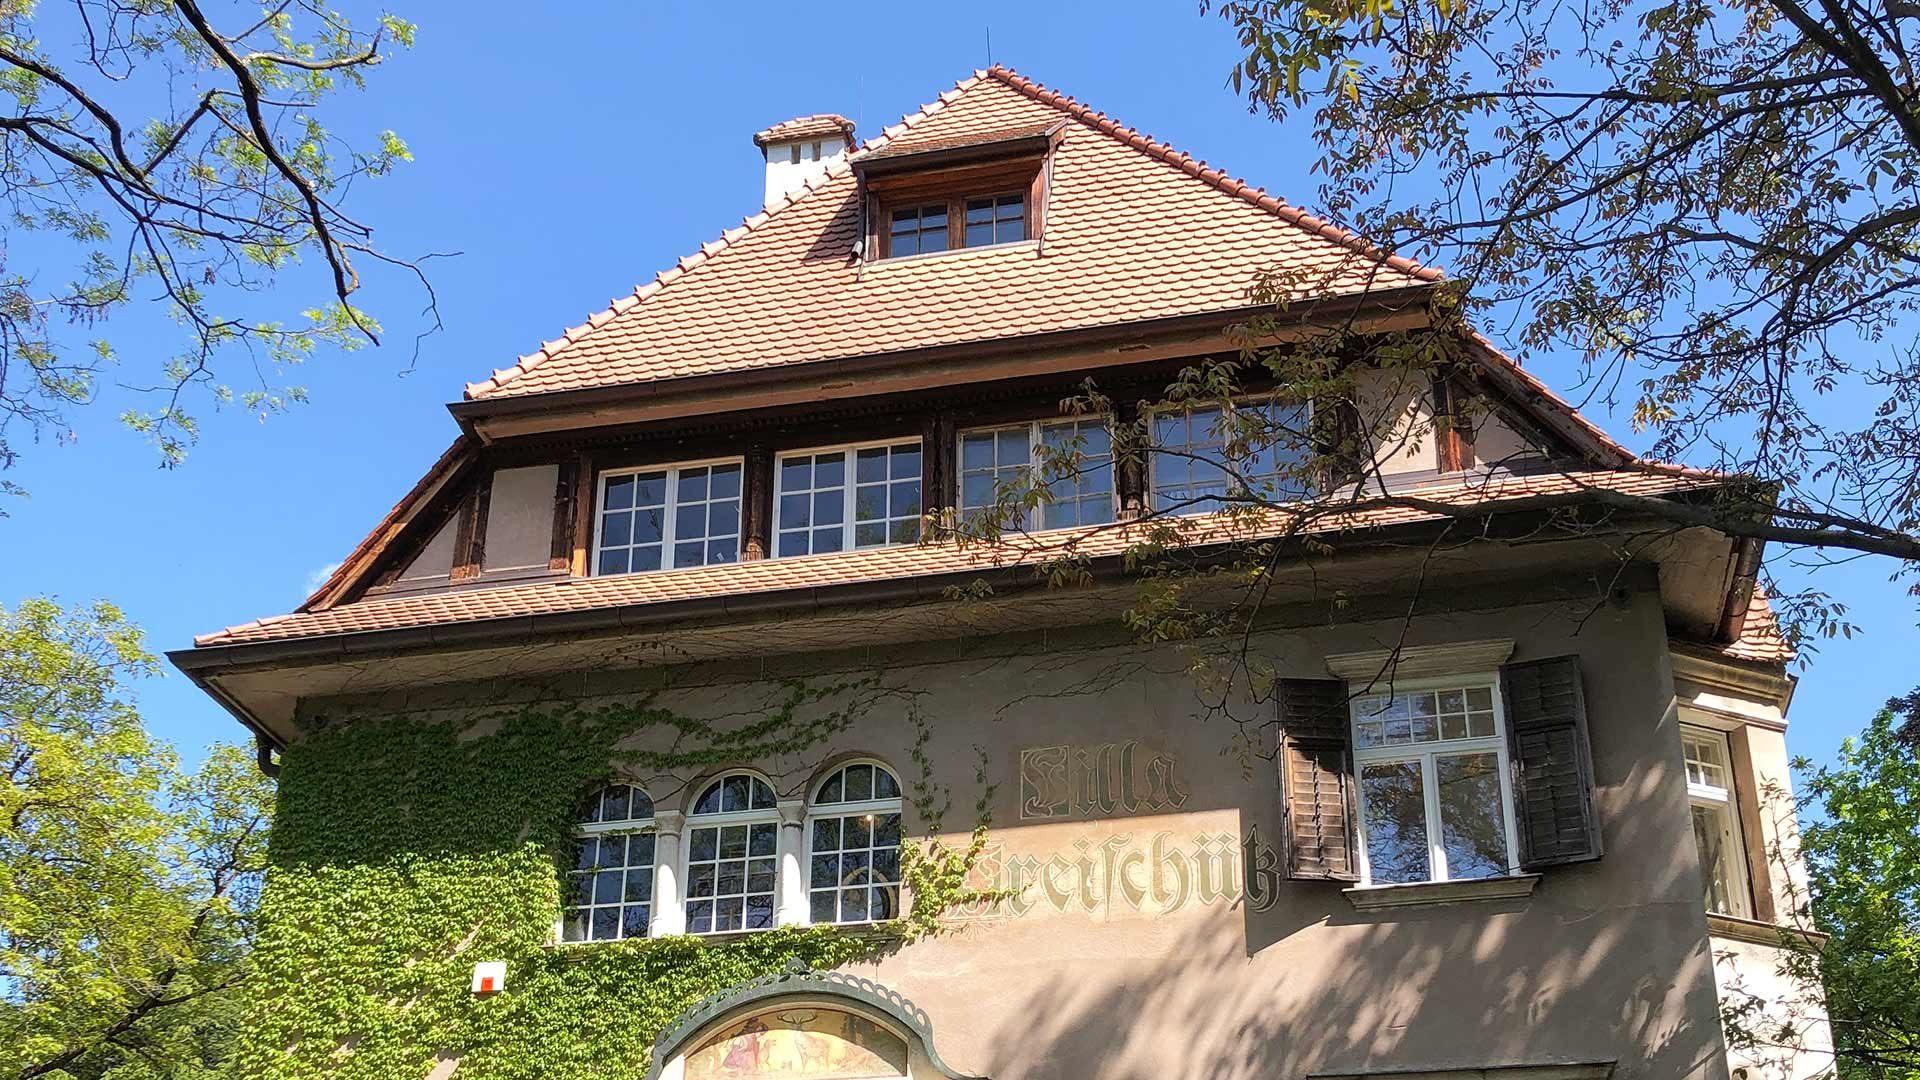 La Villa Freischütz